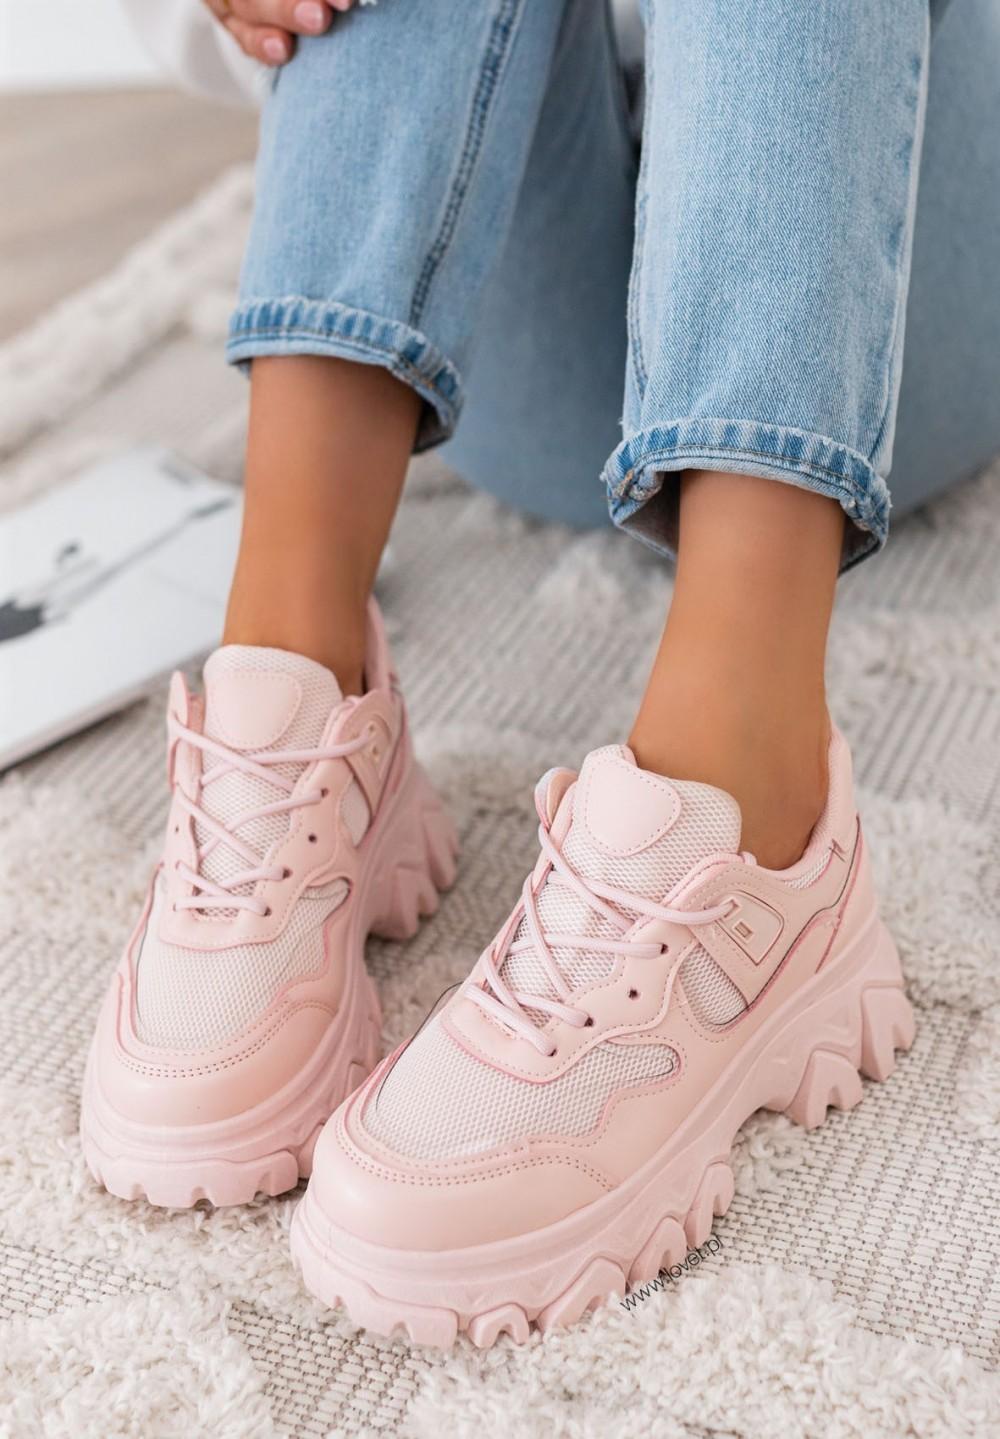 Trampki Sneakersy Różowe Sylviane